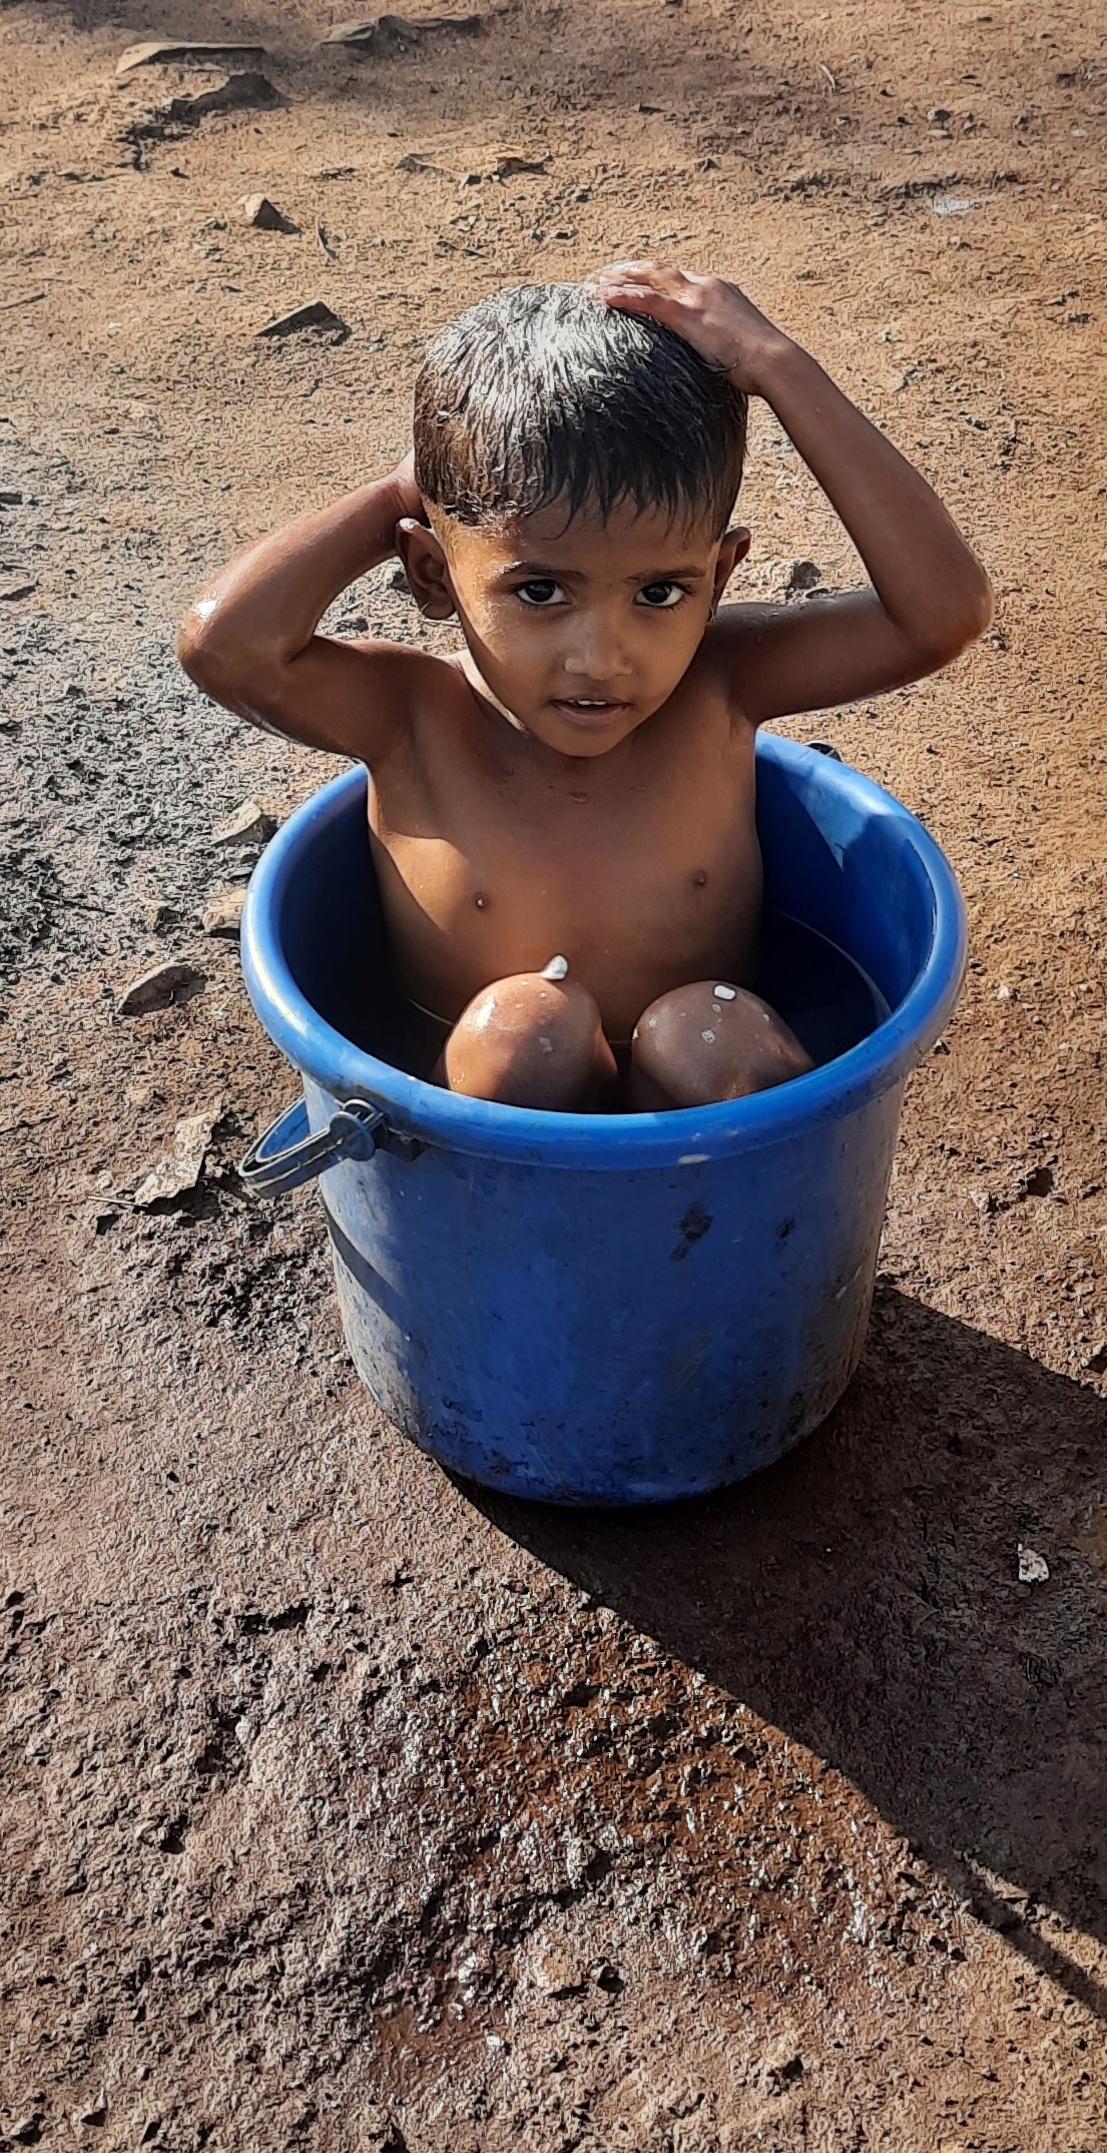 Kid bathing in the the bucket